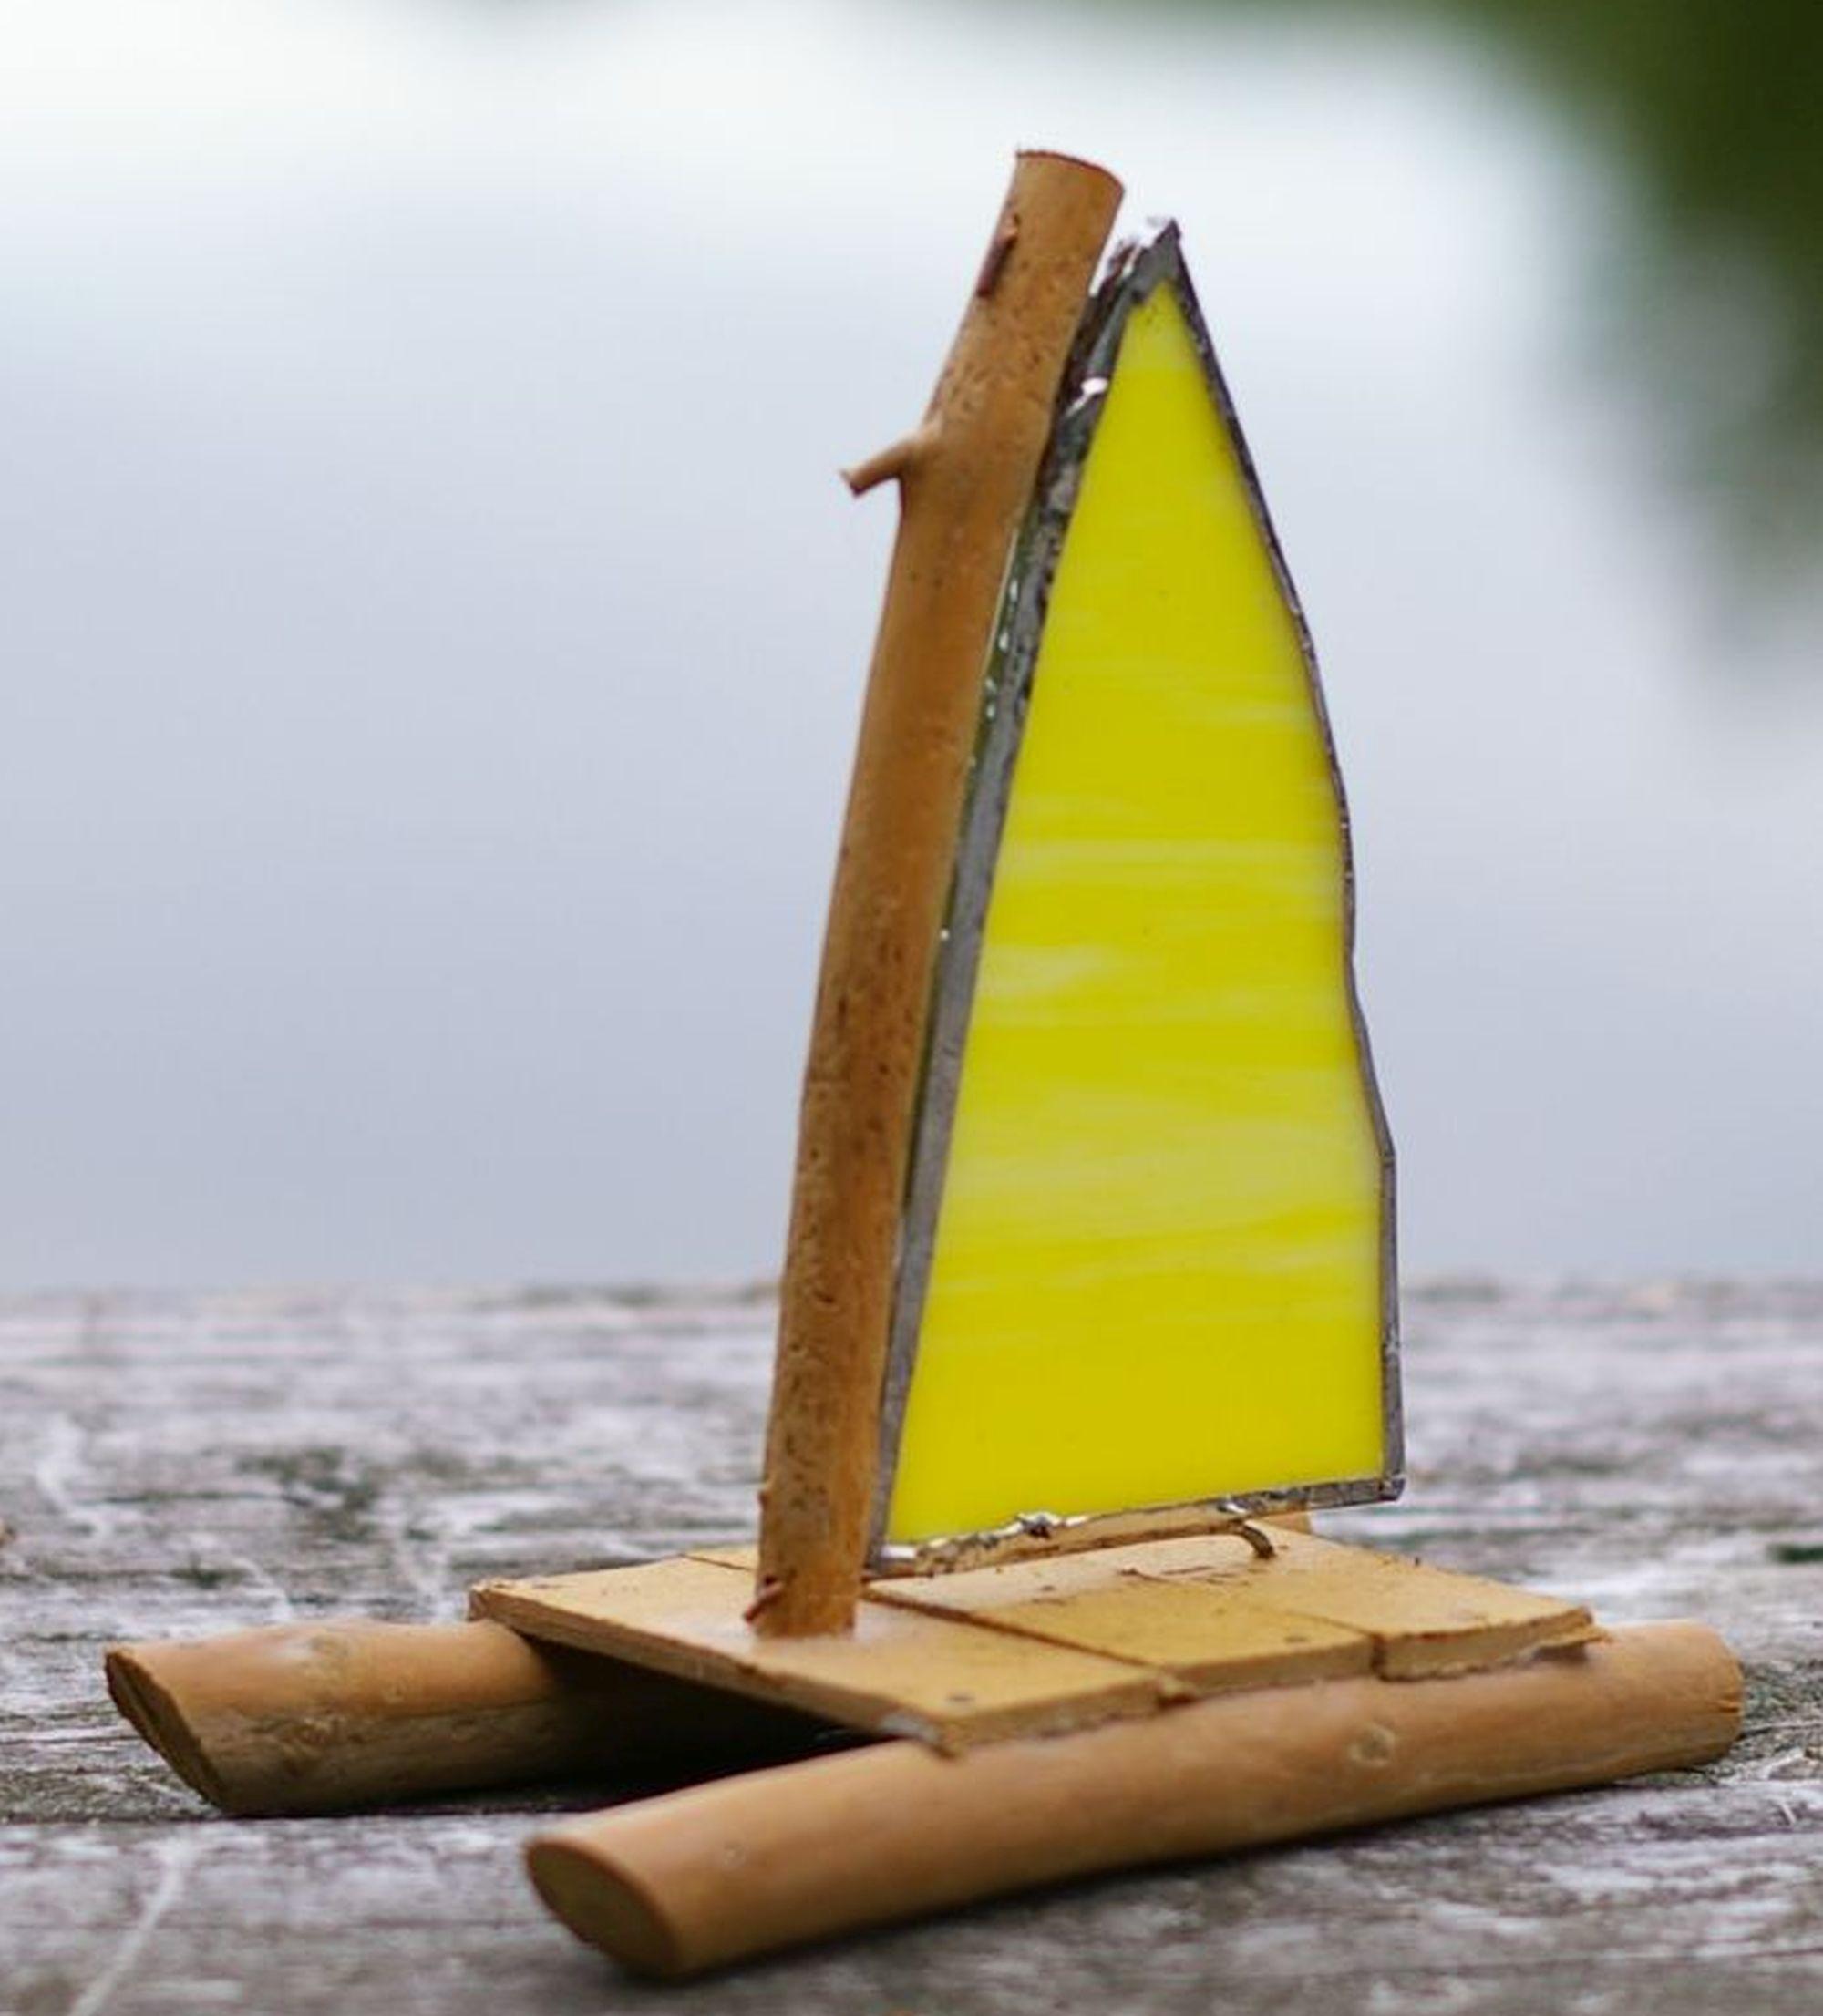 ein Mini-Katamaran aus Treibholz mit Glassegeln